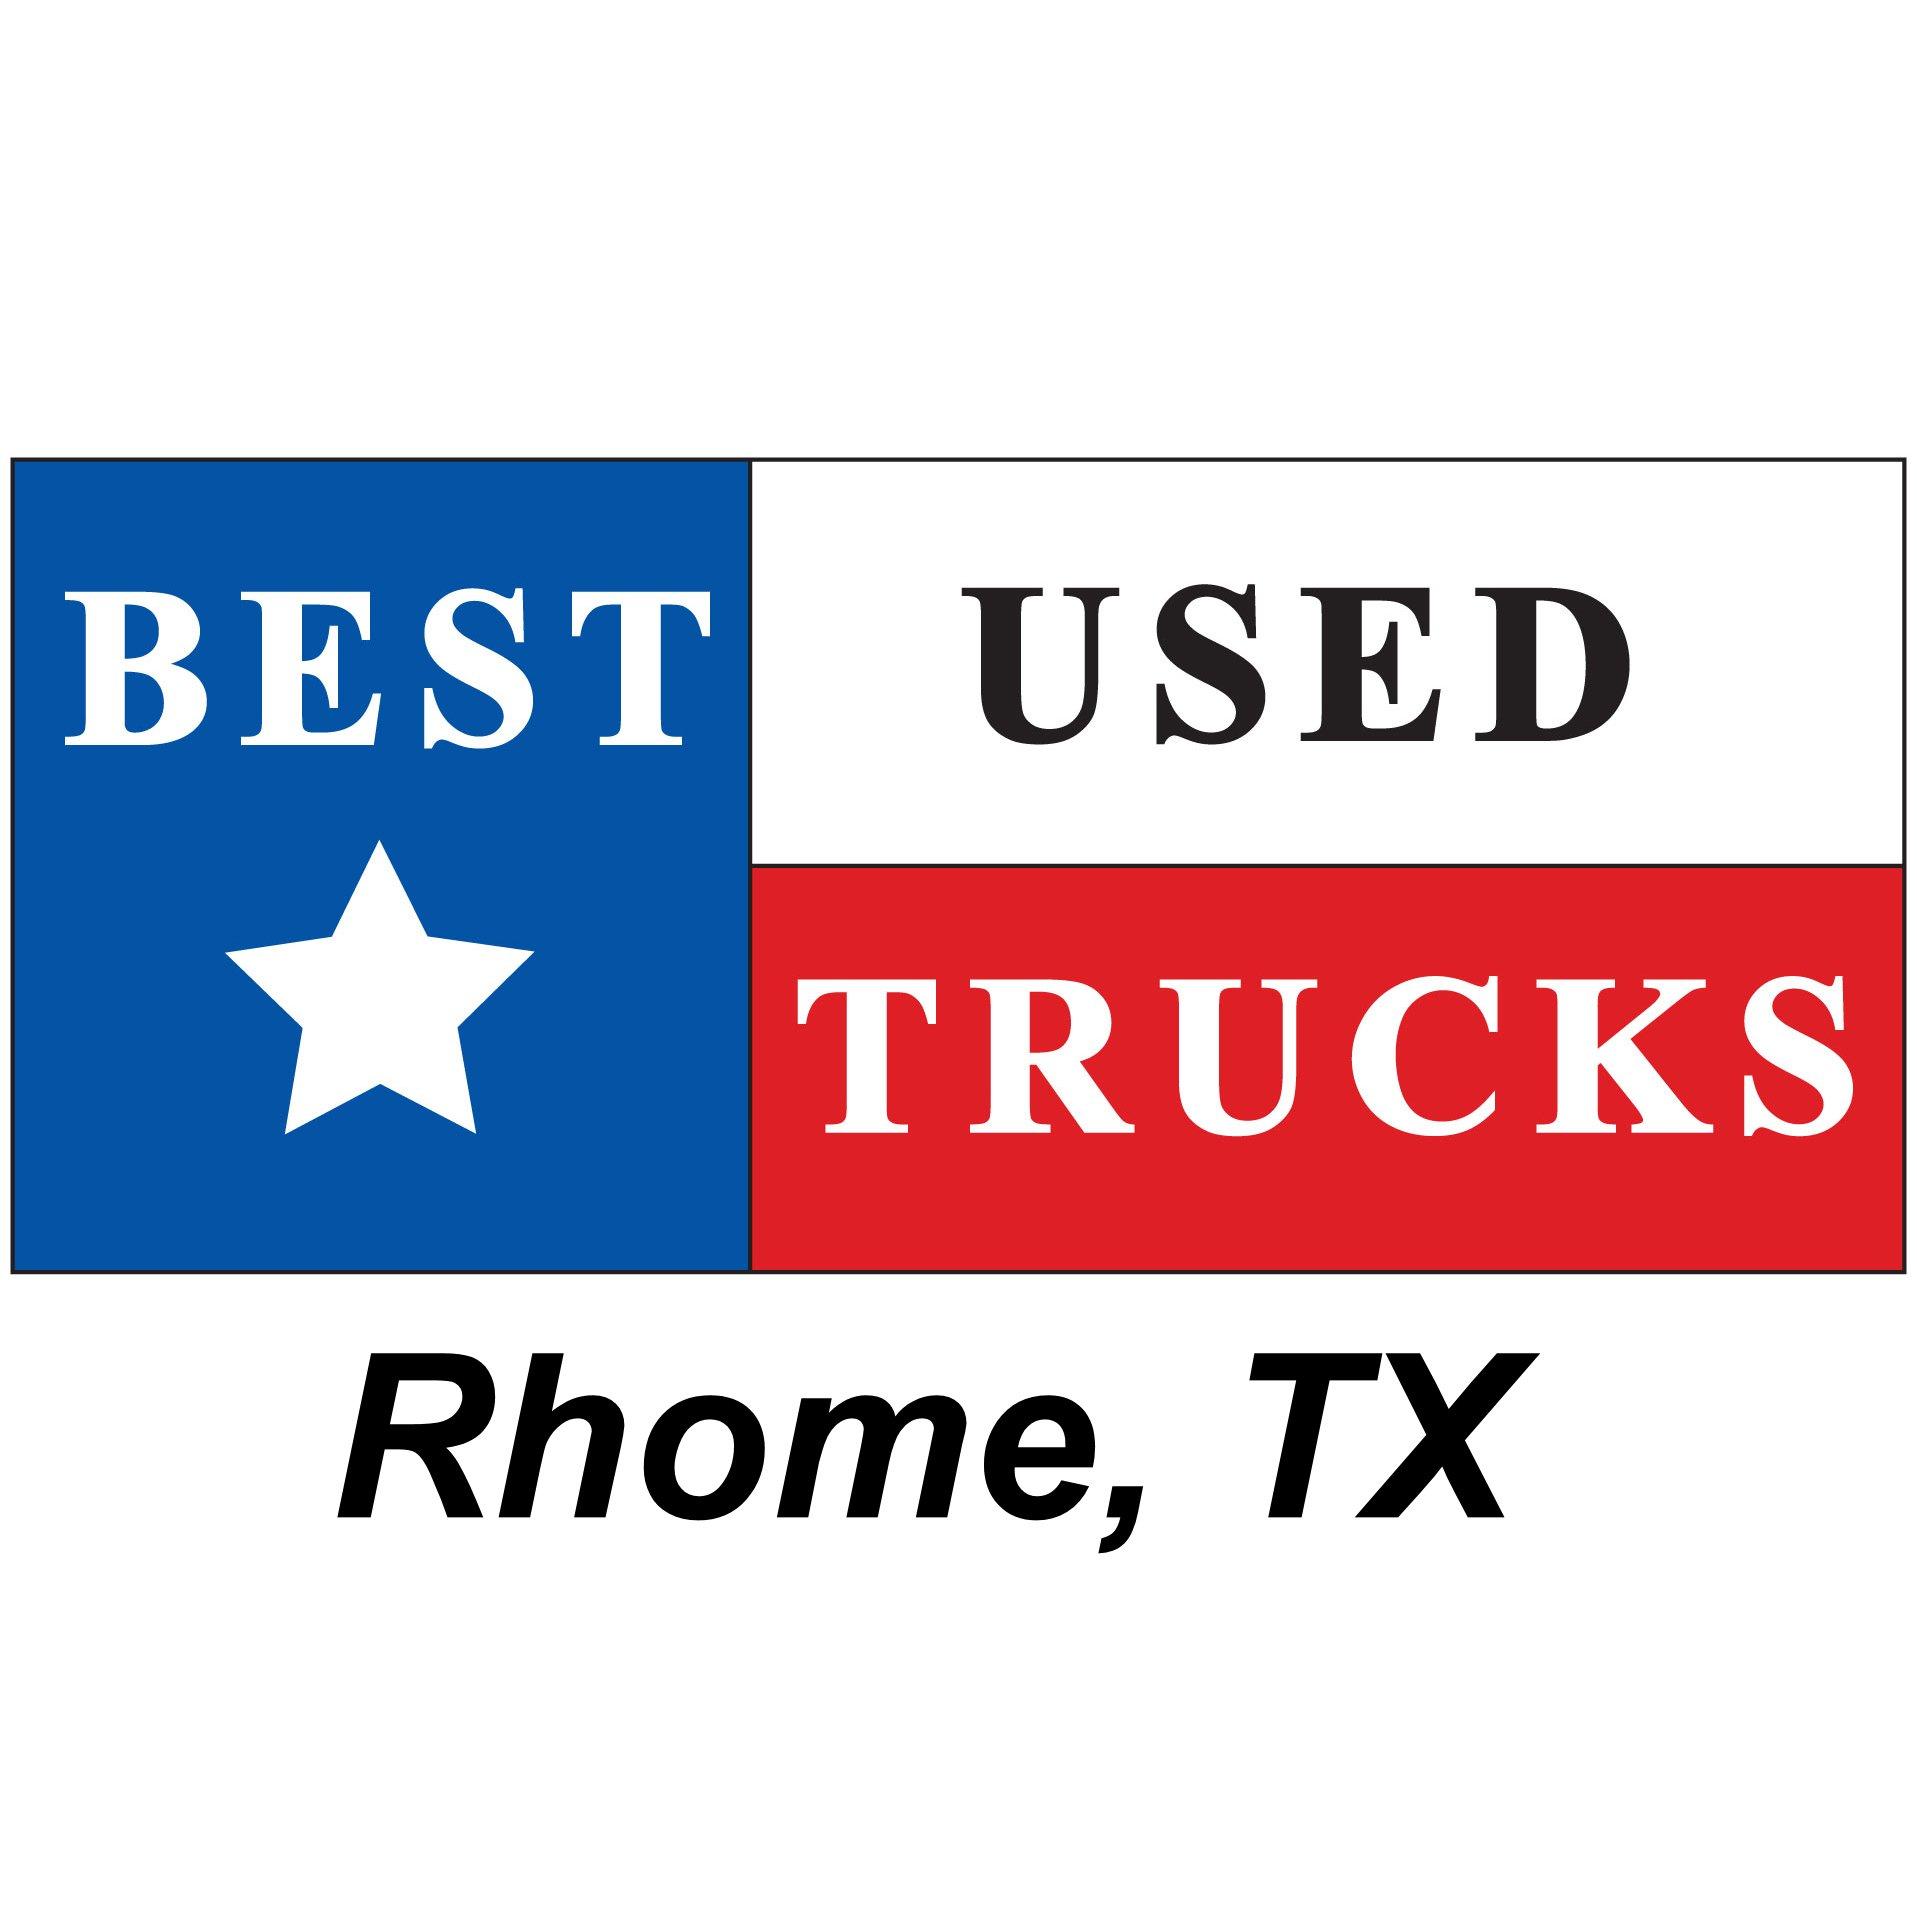 Best Used Trucks